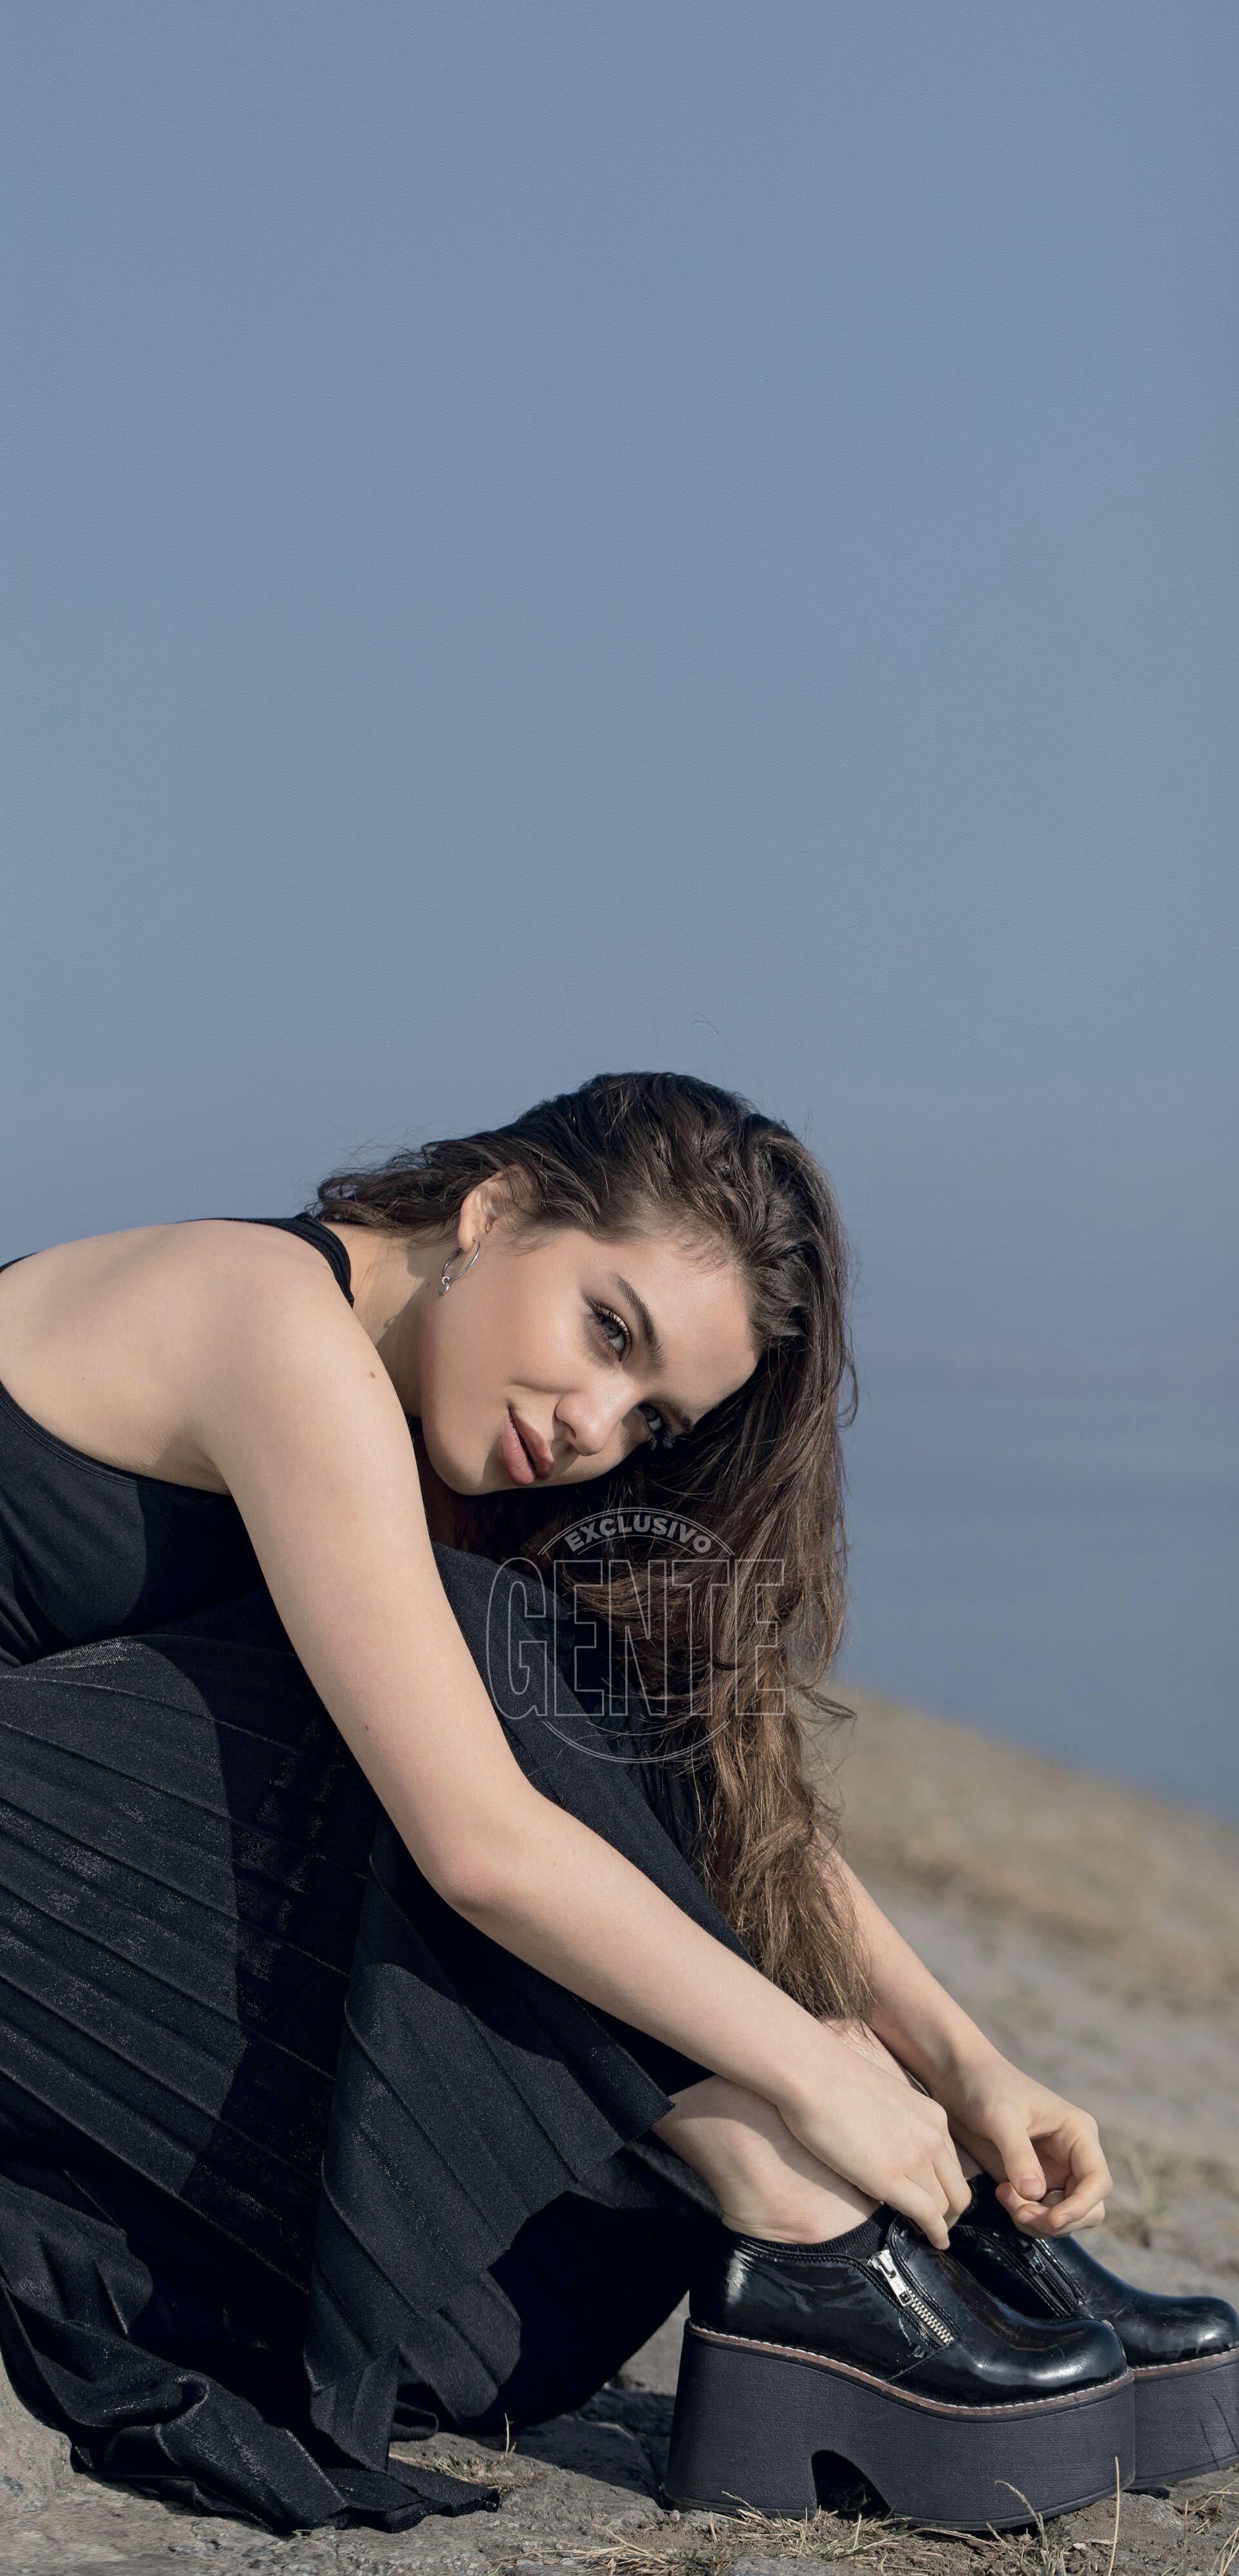 Malena Narvay (Foto Chistian Beliera/GENTE)